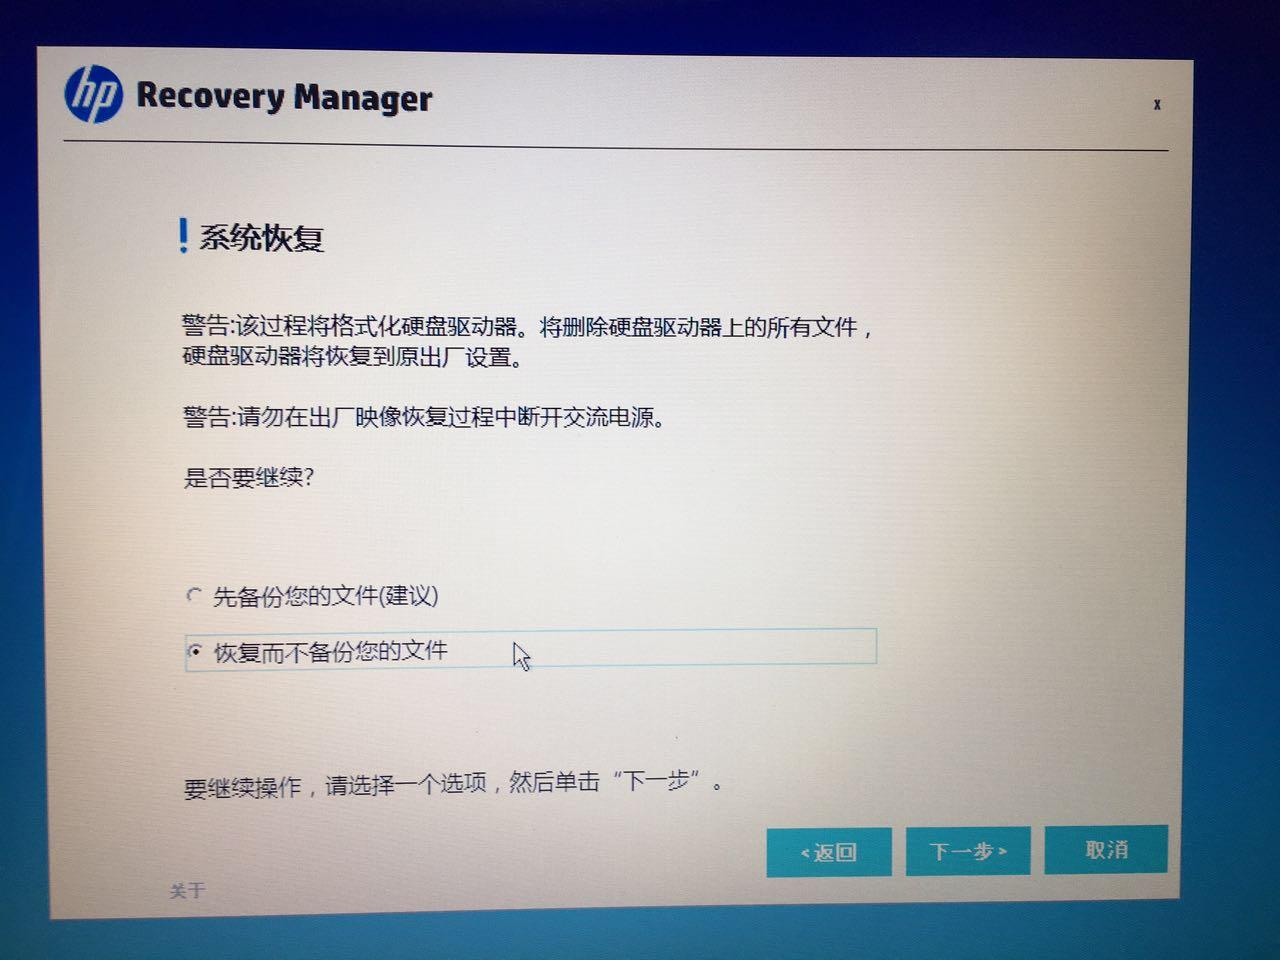 HP Recovery 恢复U盘使用说明